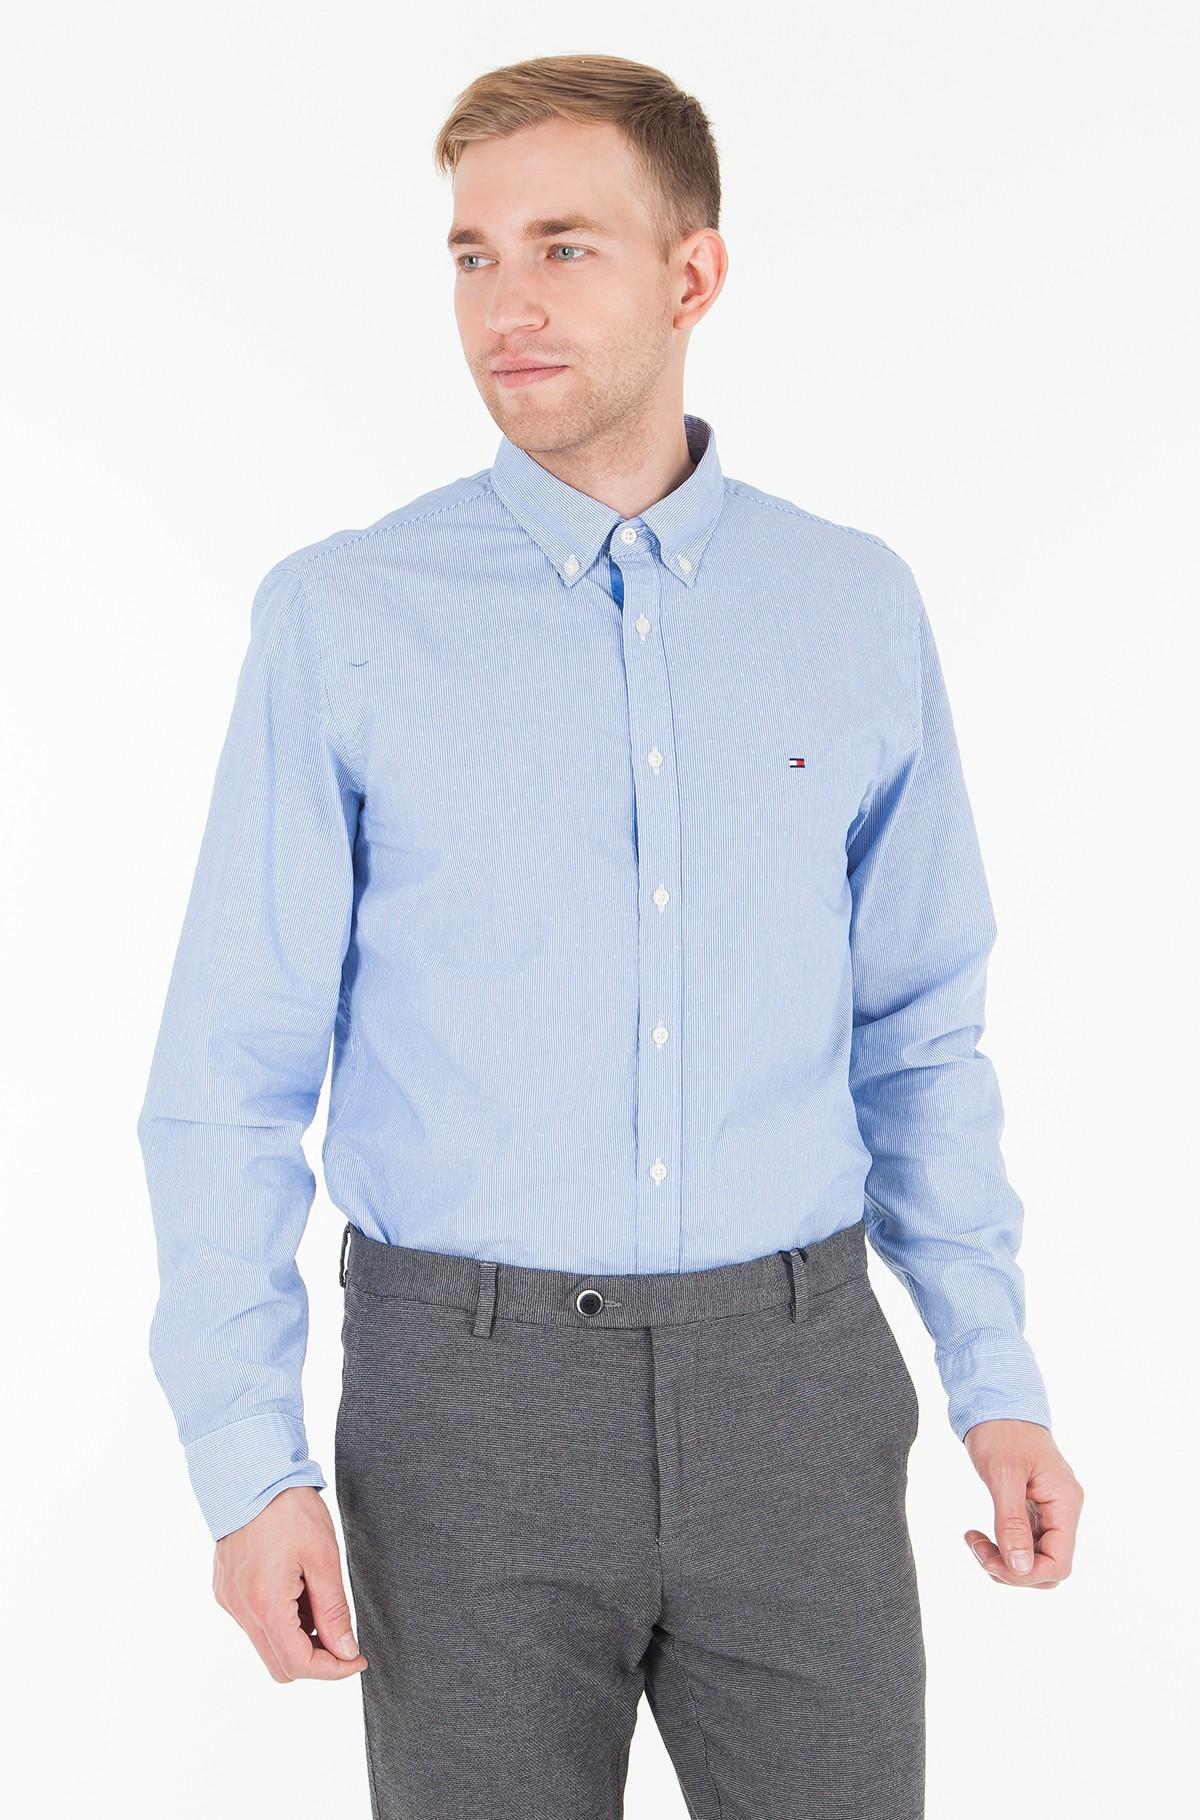 Marškiniai ENGINEERED STRIPED DOBBY SHIRT-full-1